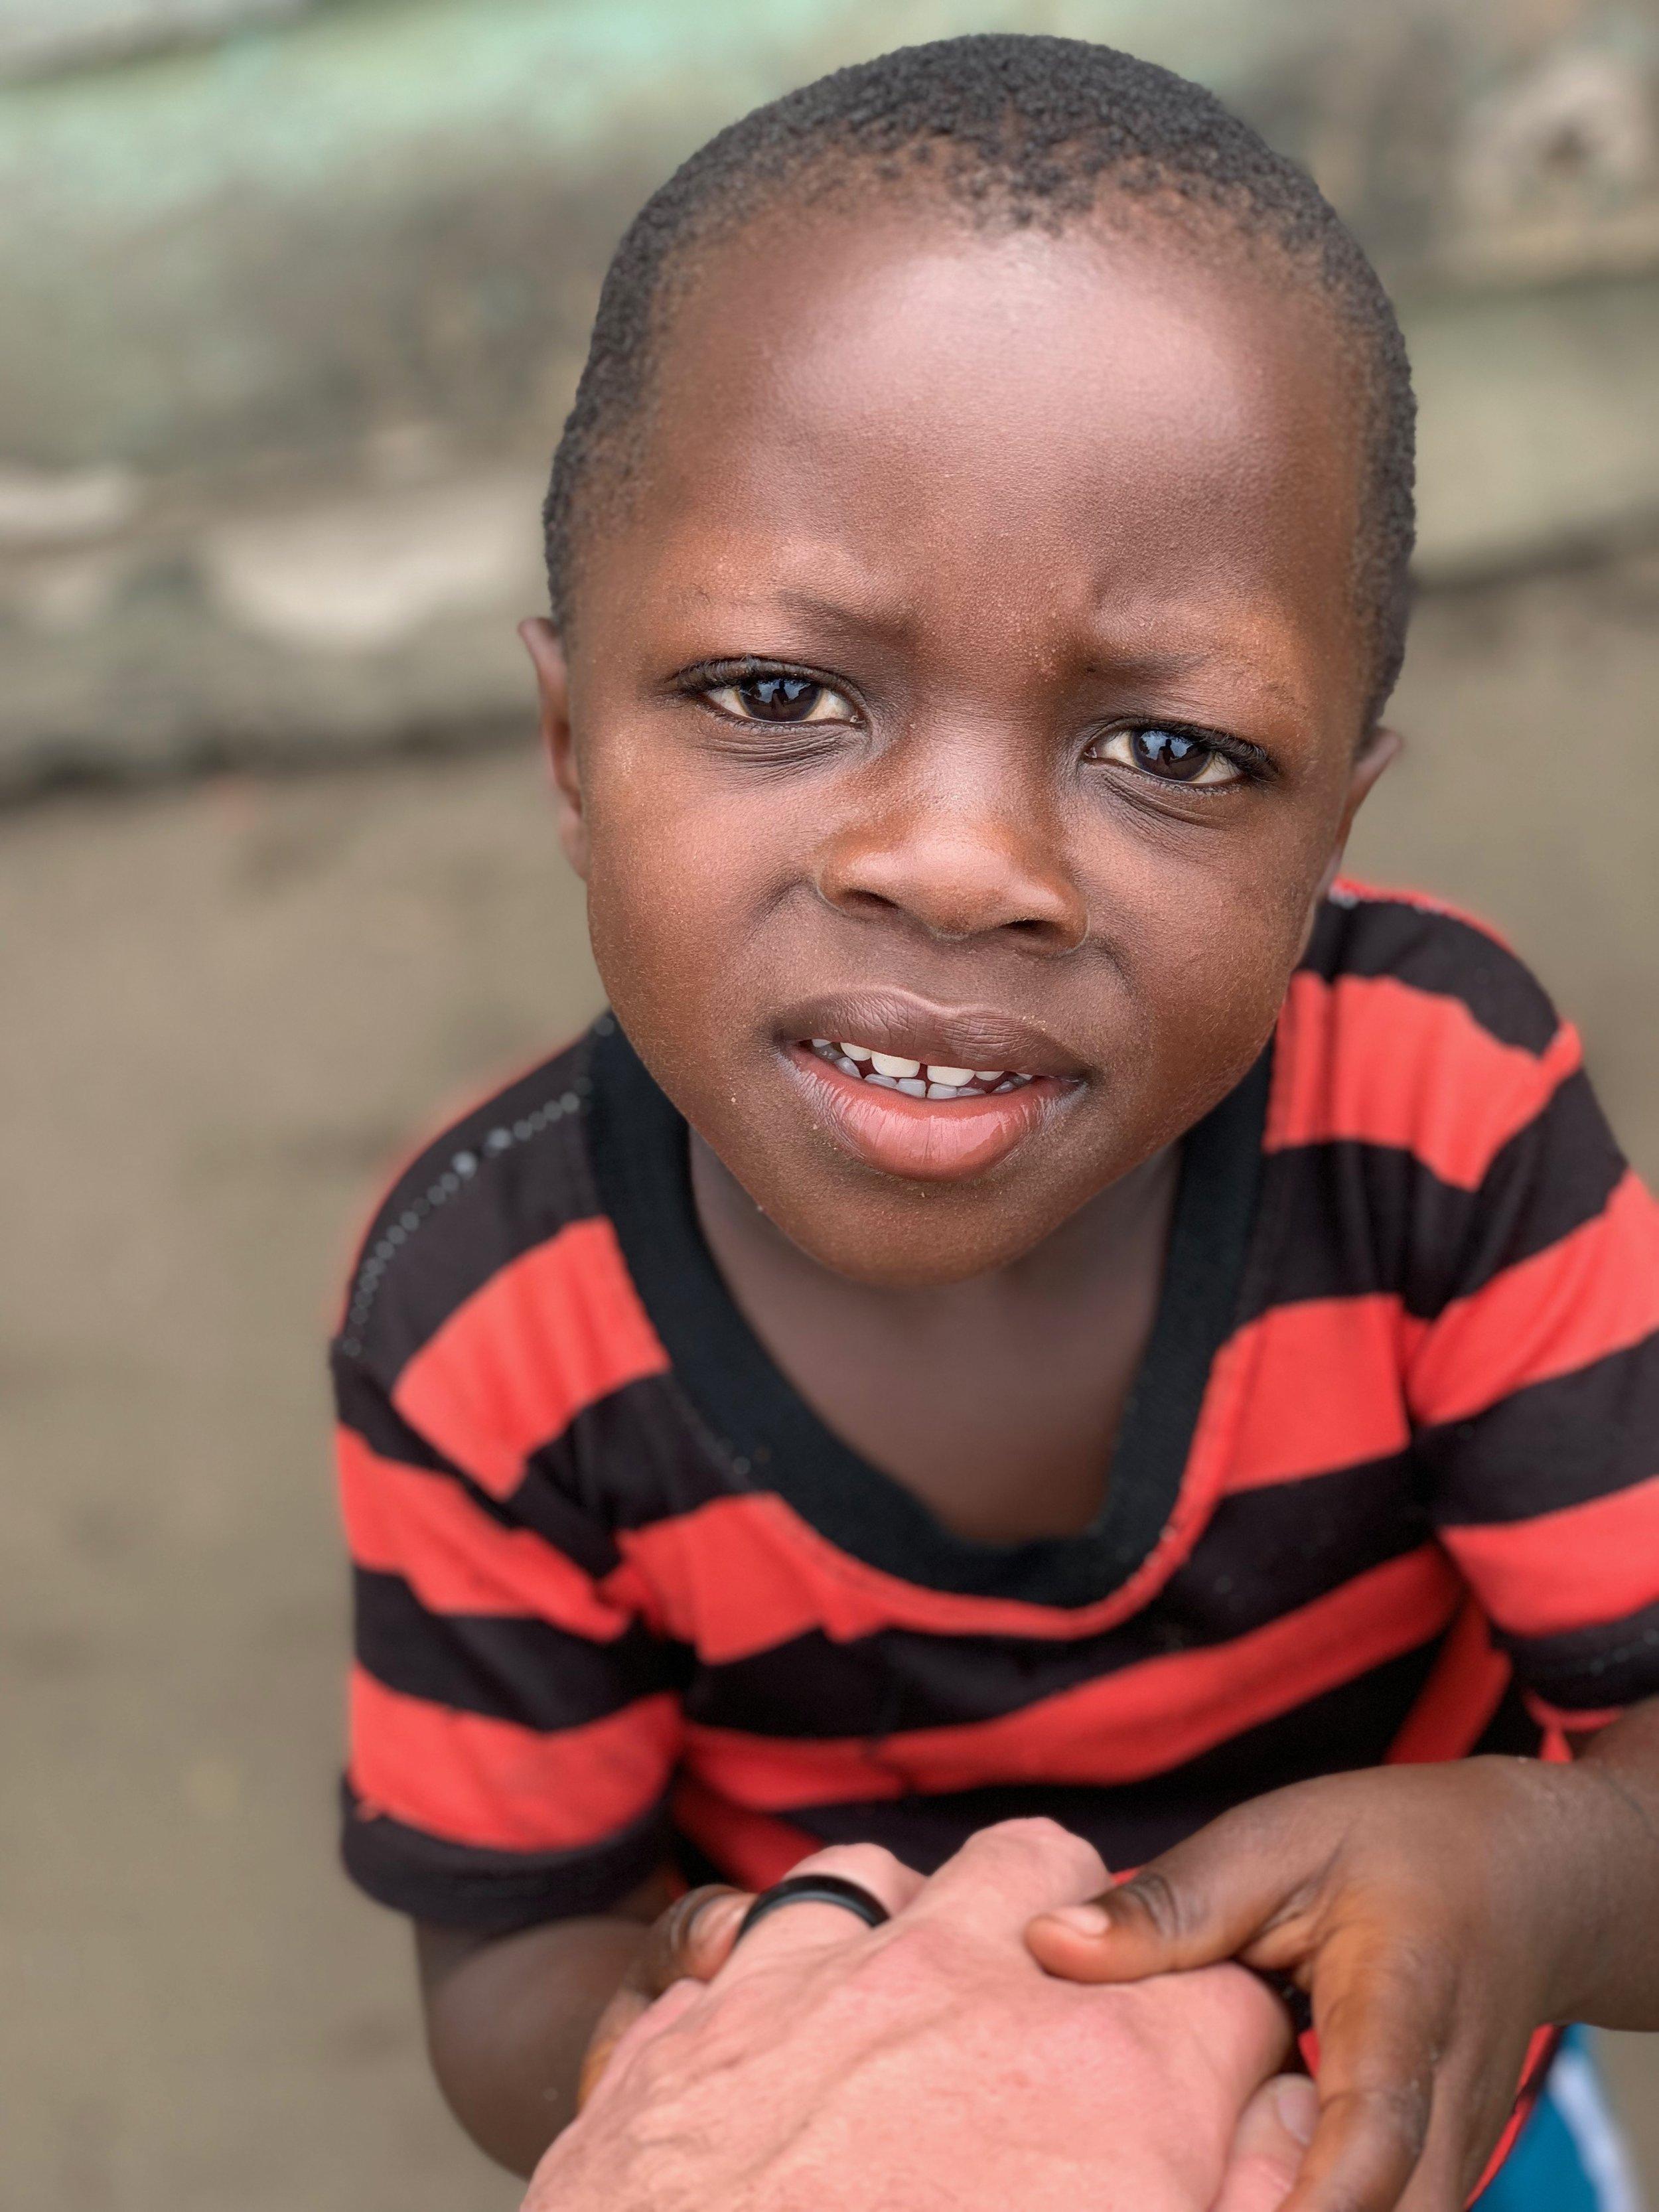 My new friend in Uganda…